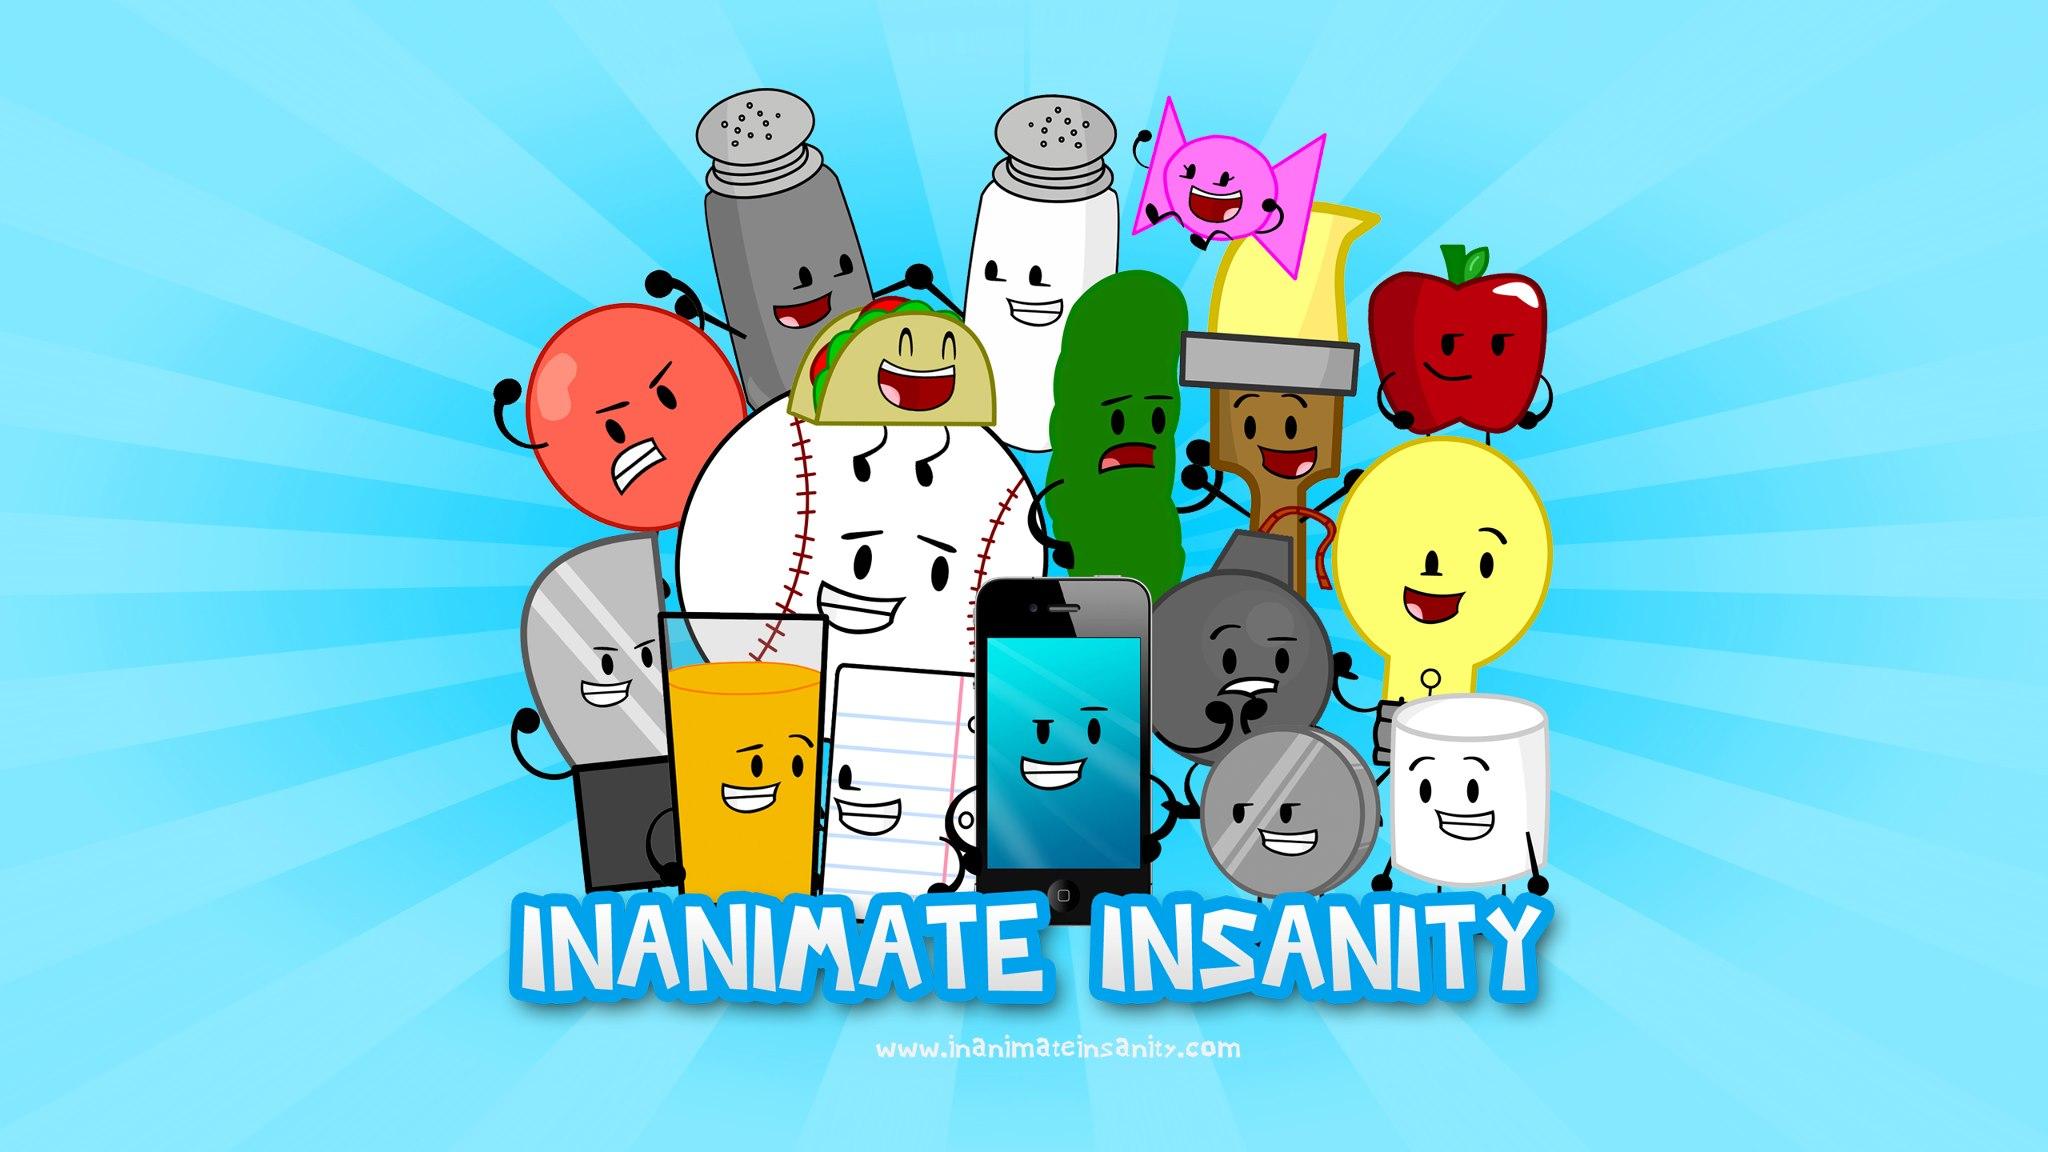 Adam Dormi in Inanimate Insanity (2011)